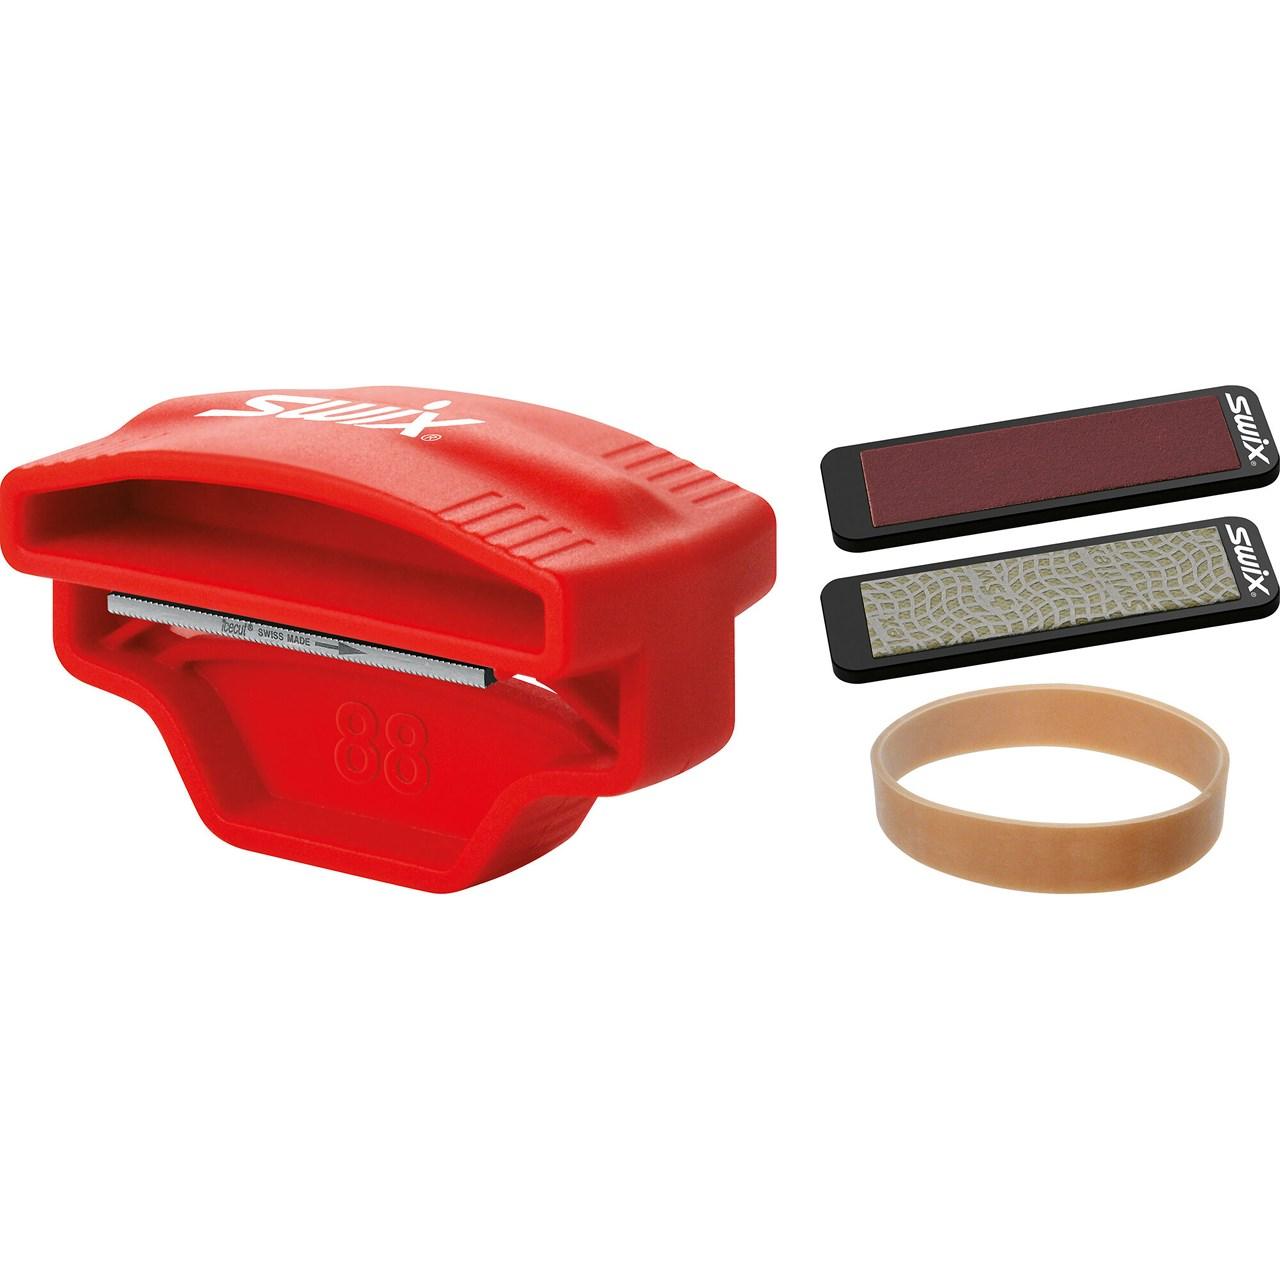 Compact edger kit